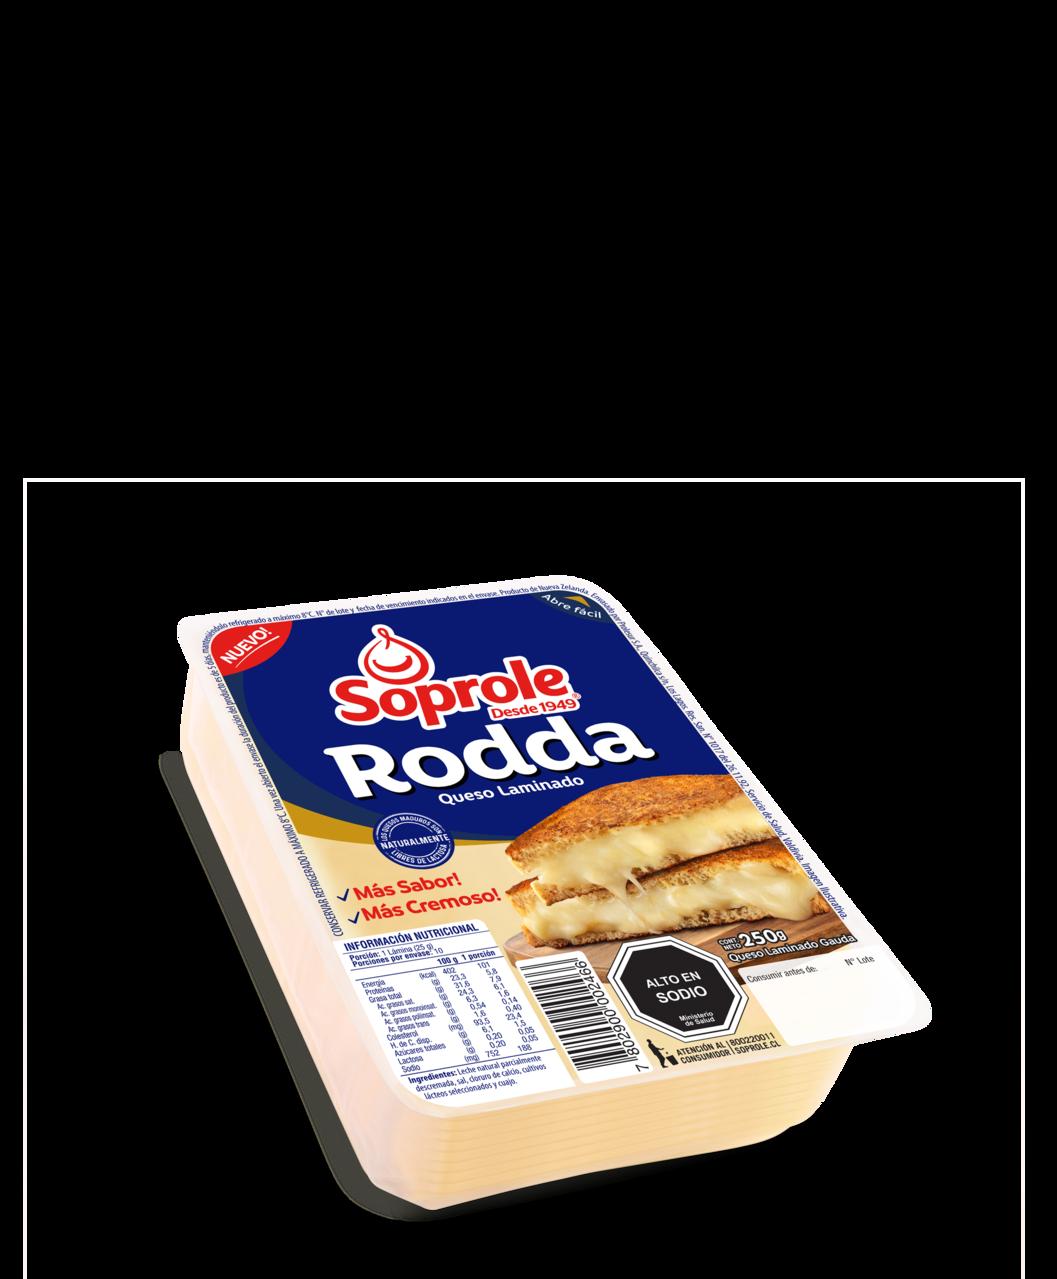 Soprole queso Rodda laminado 250g